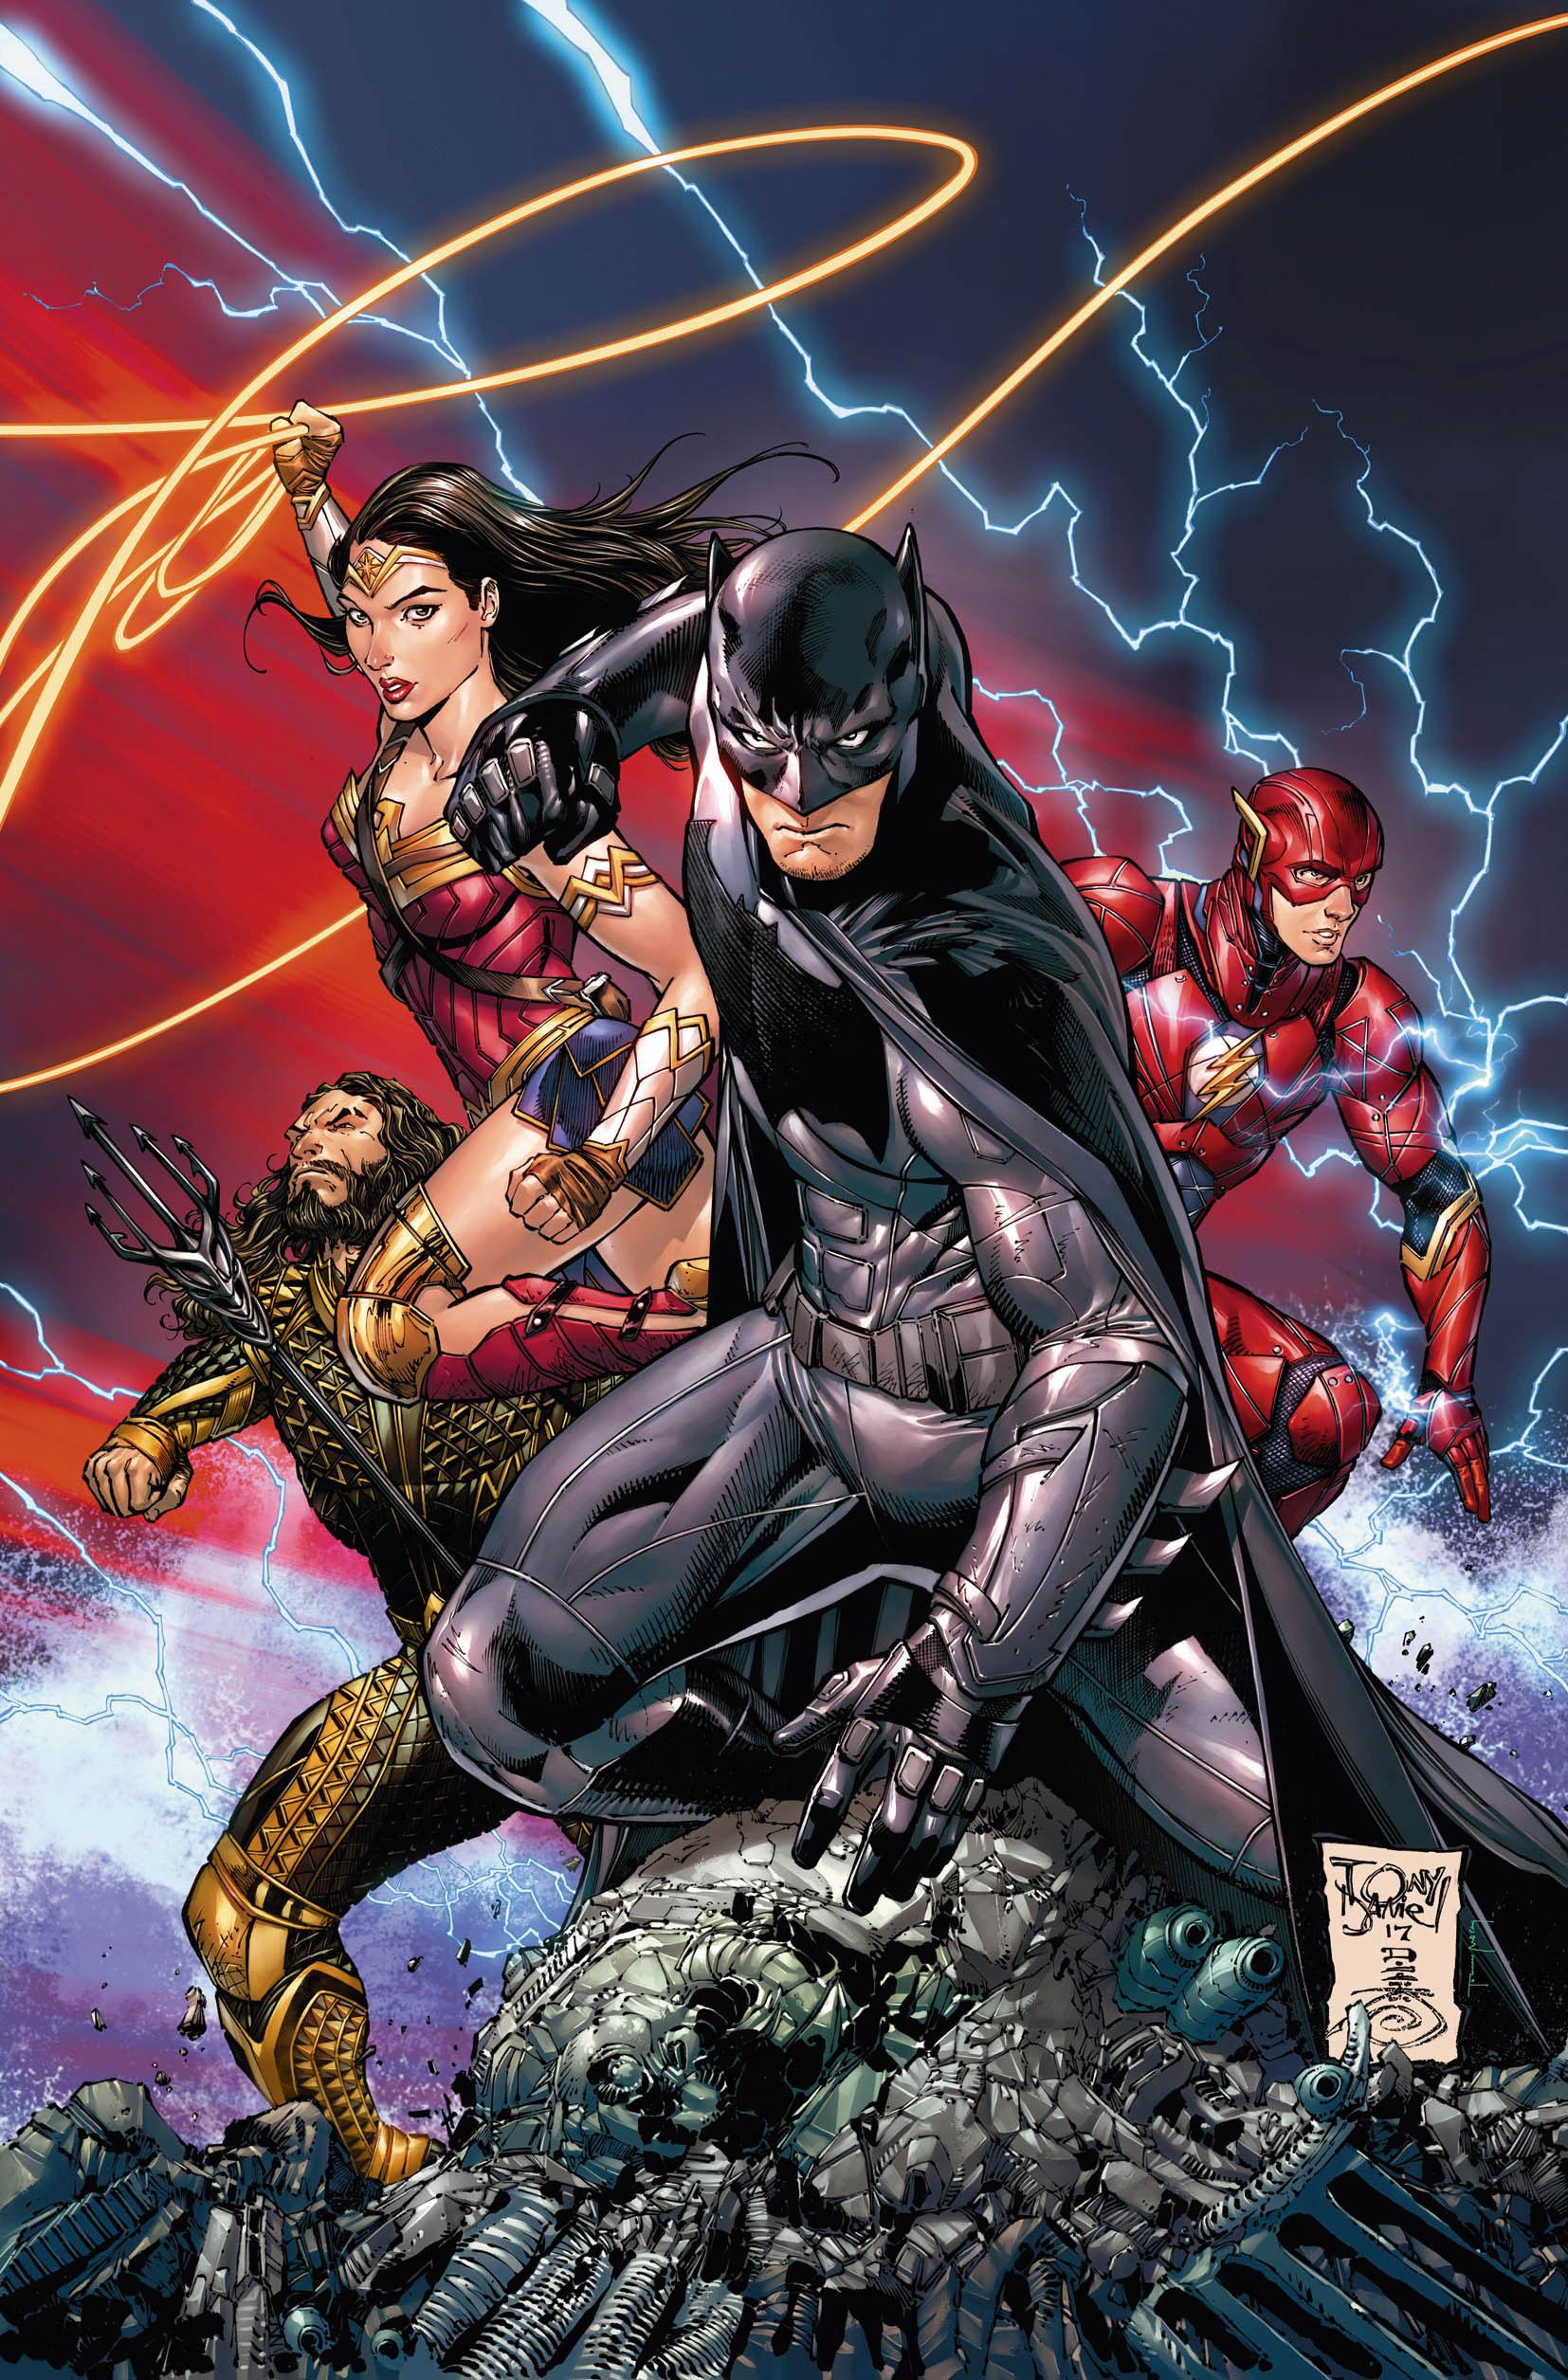 Aquaman, Wonder Woman, Batman and the Flash striking a heroic pose